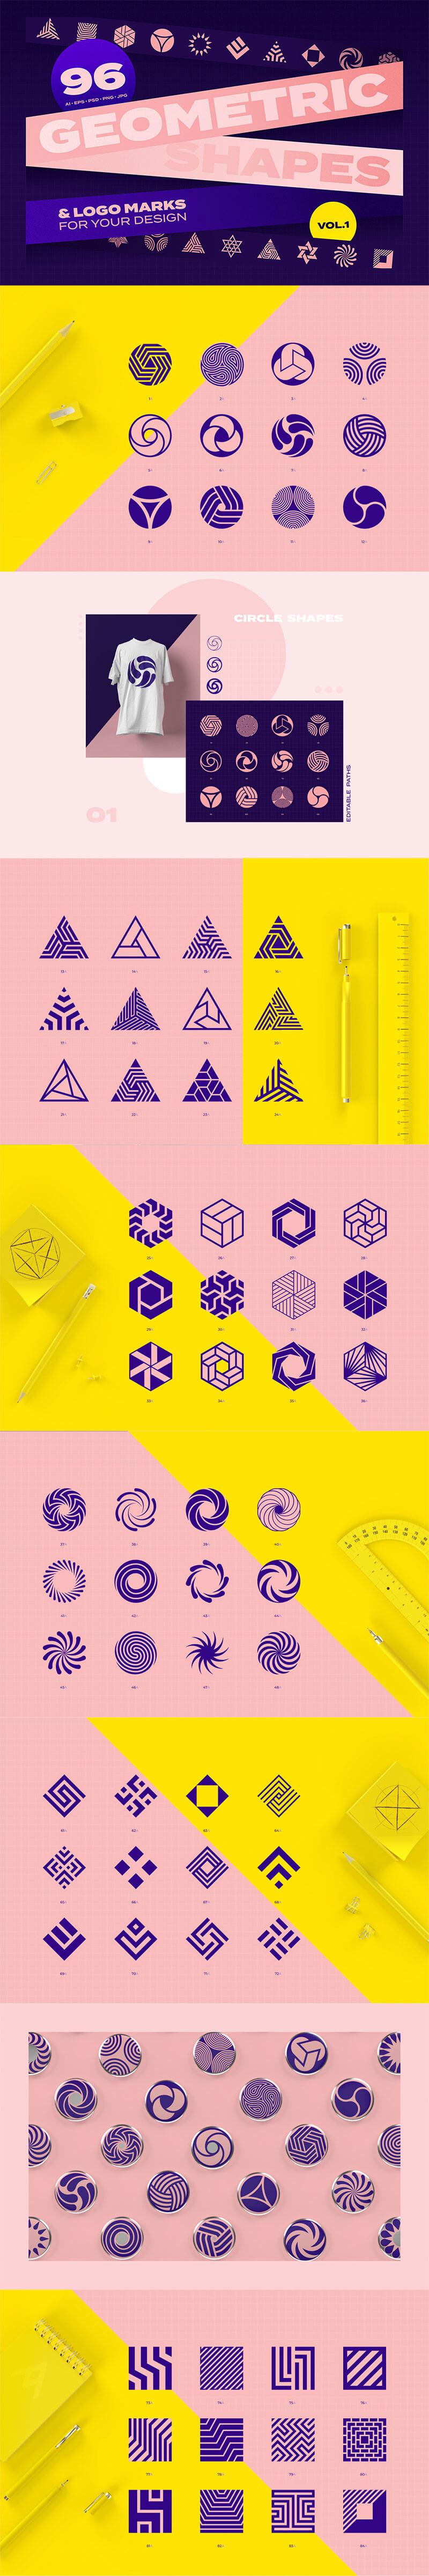 creators-inspiring-artistic-collection-014-a